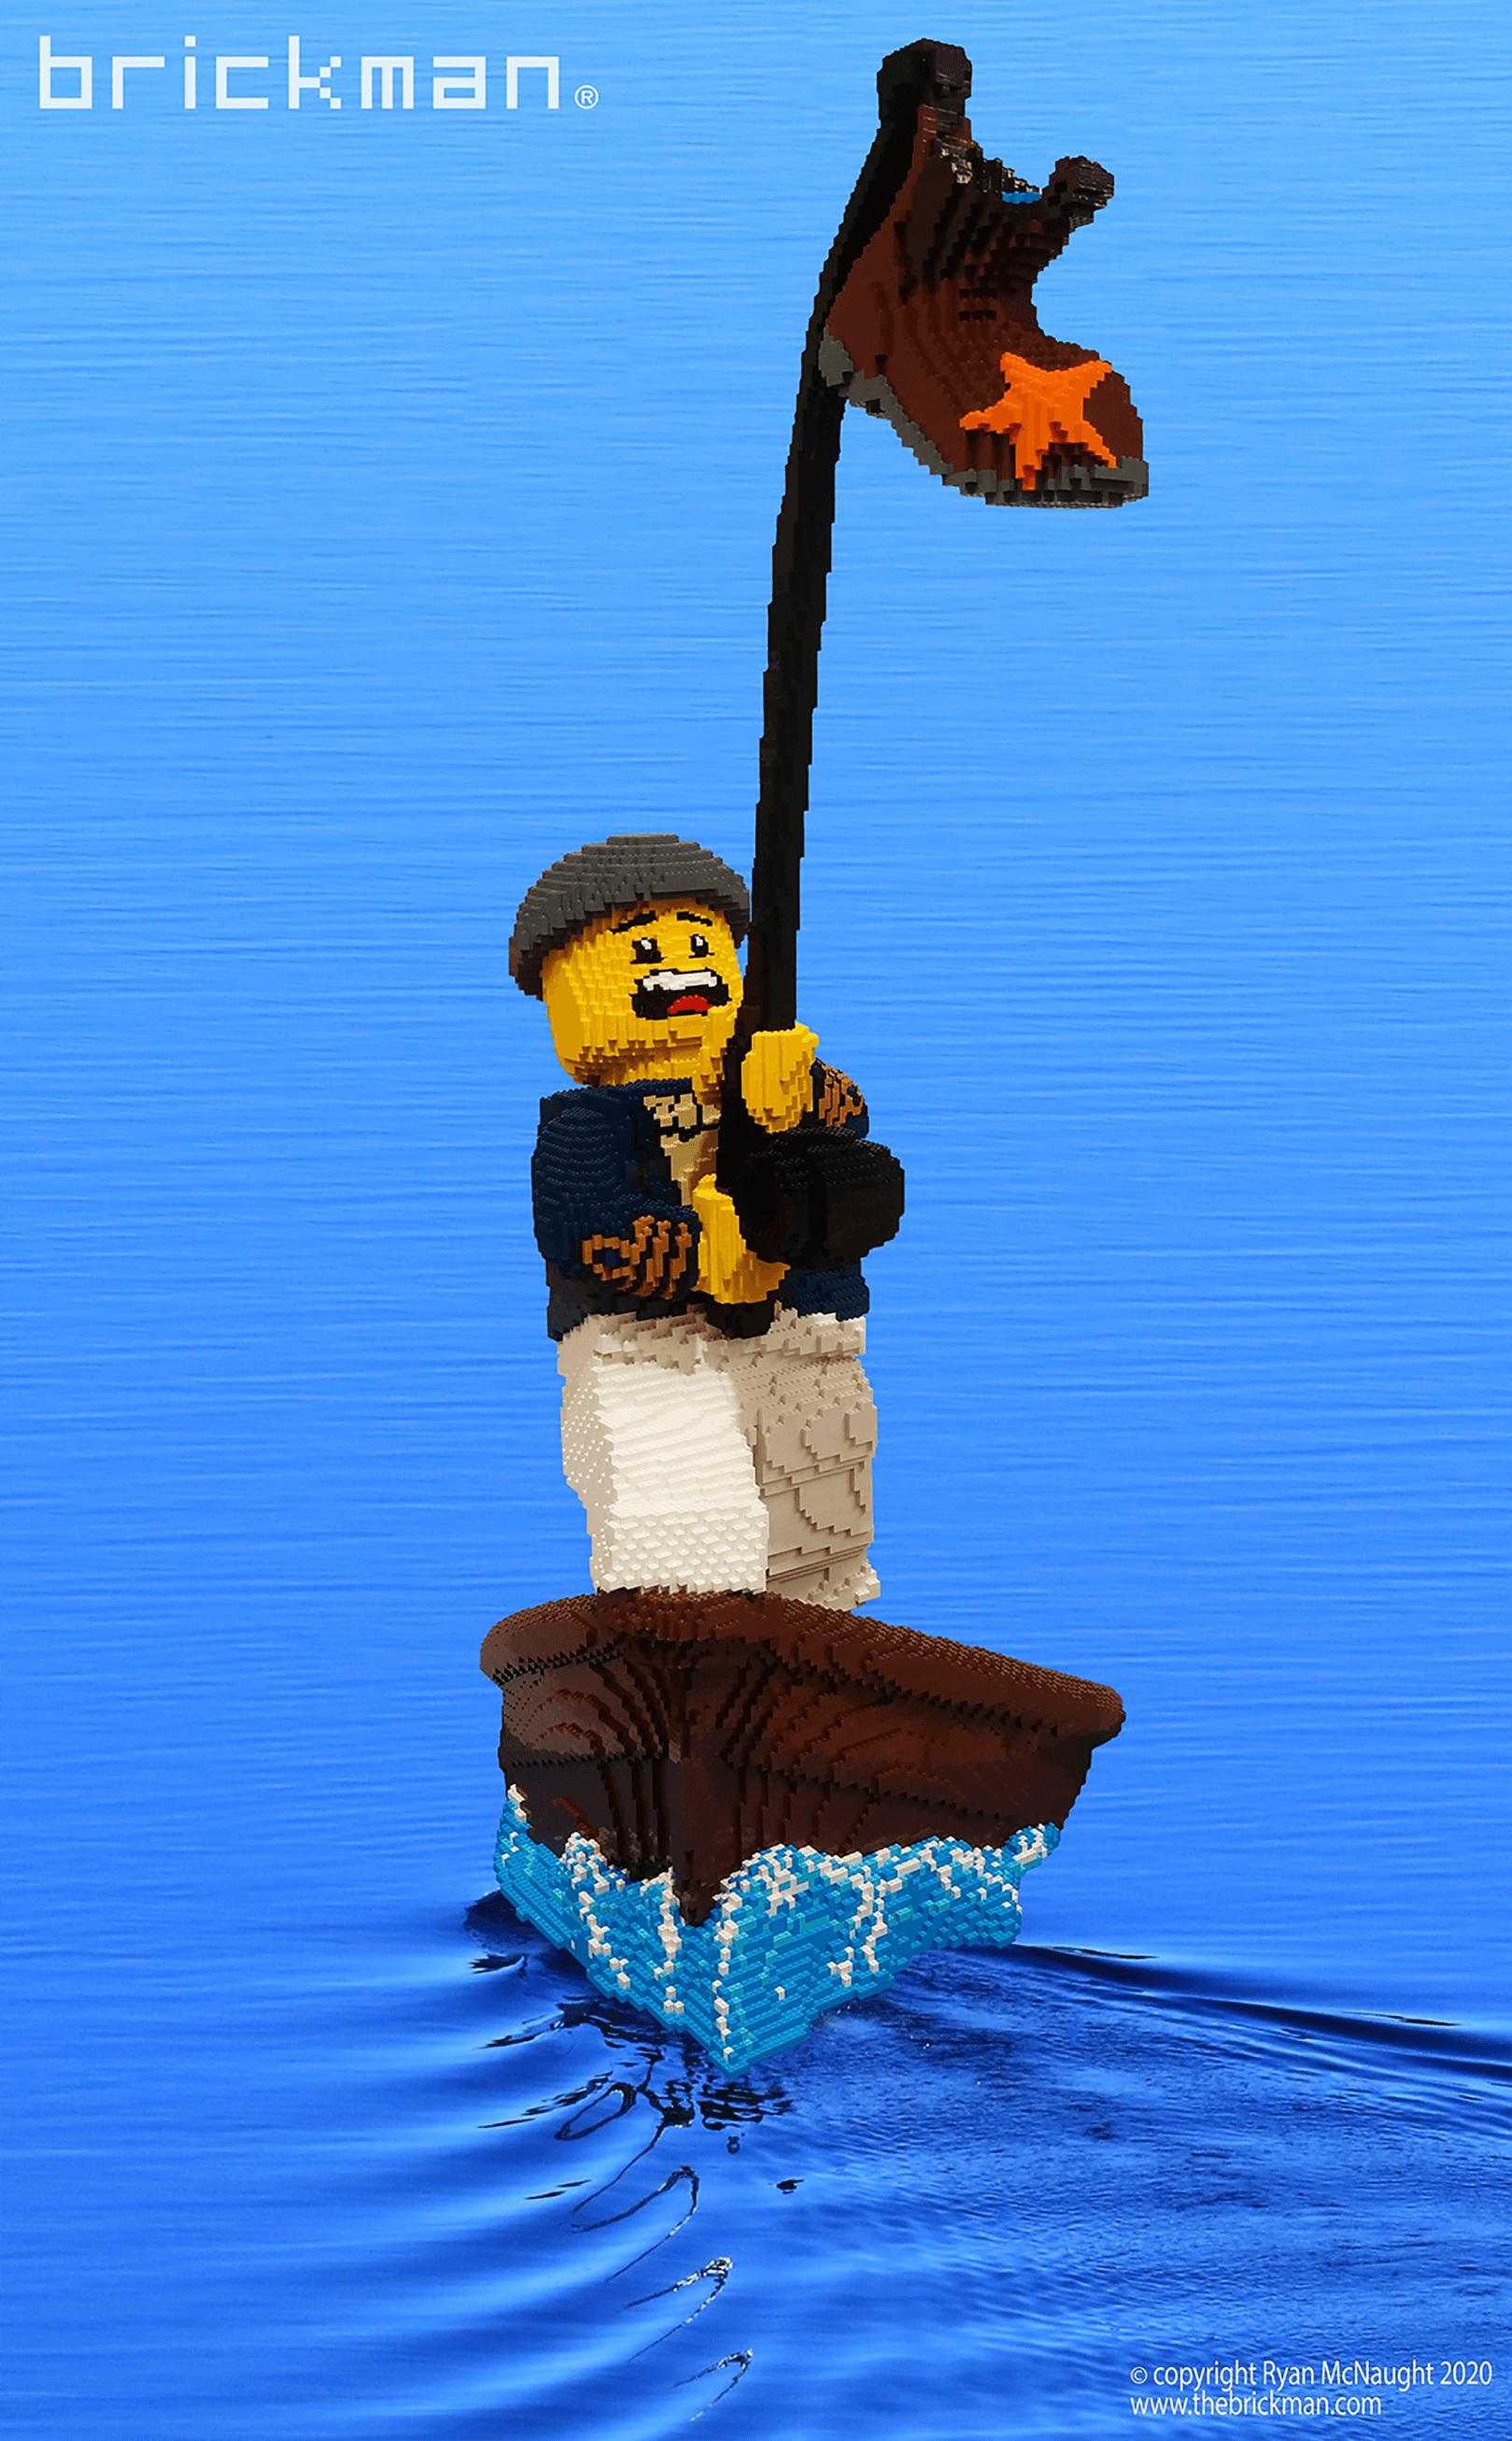 LEGO brick Frank Fishreman